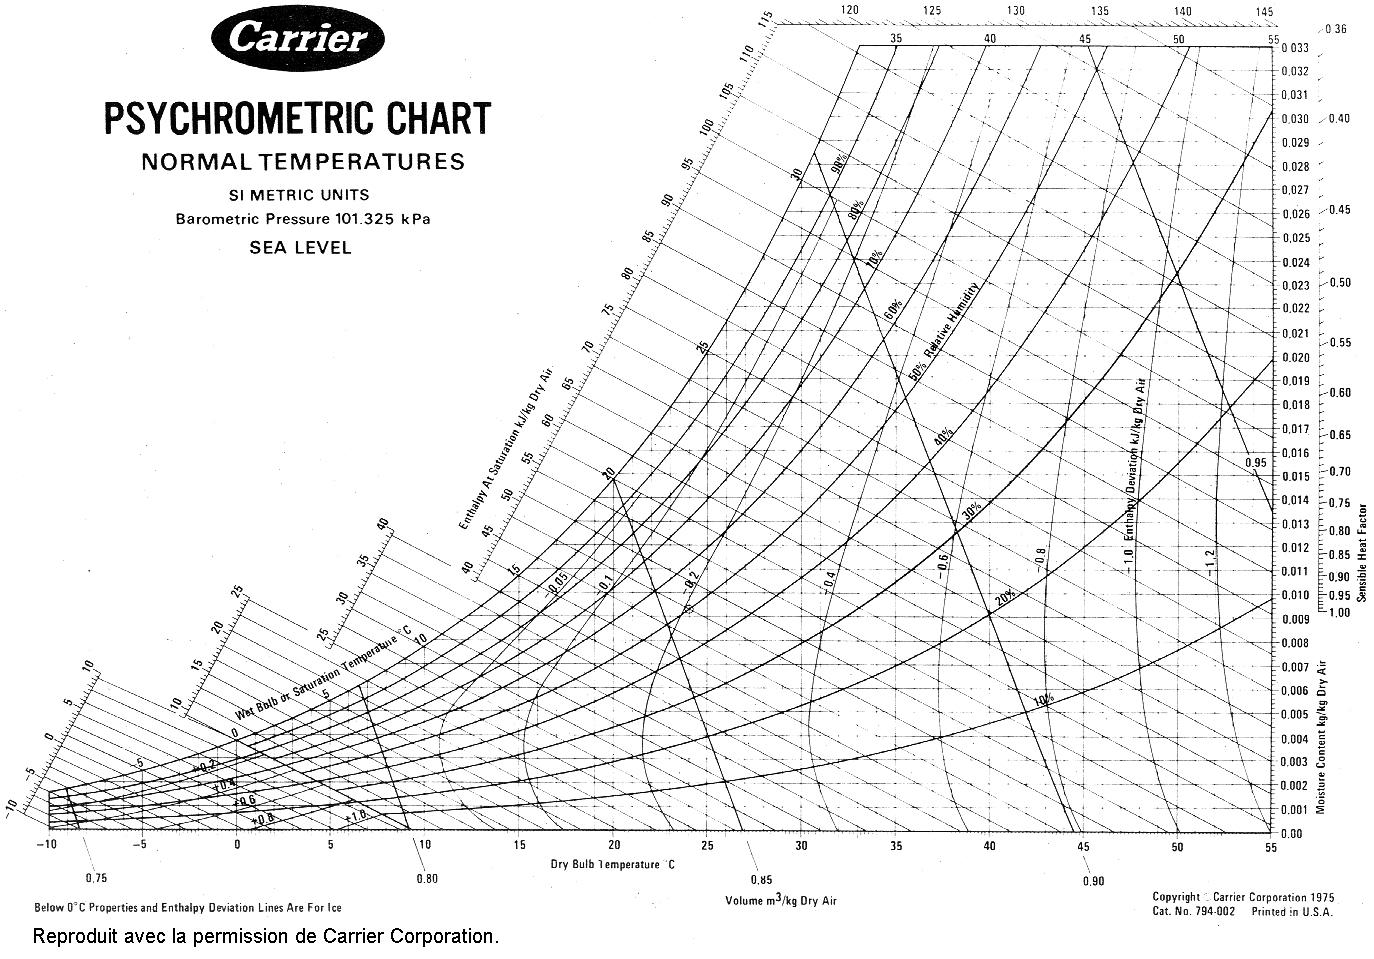 Hd Wallpapers Psychrometric Chart A3 Pdf - Printable Psychrometric Chart Free